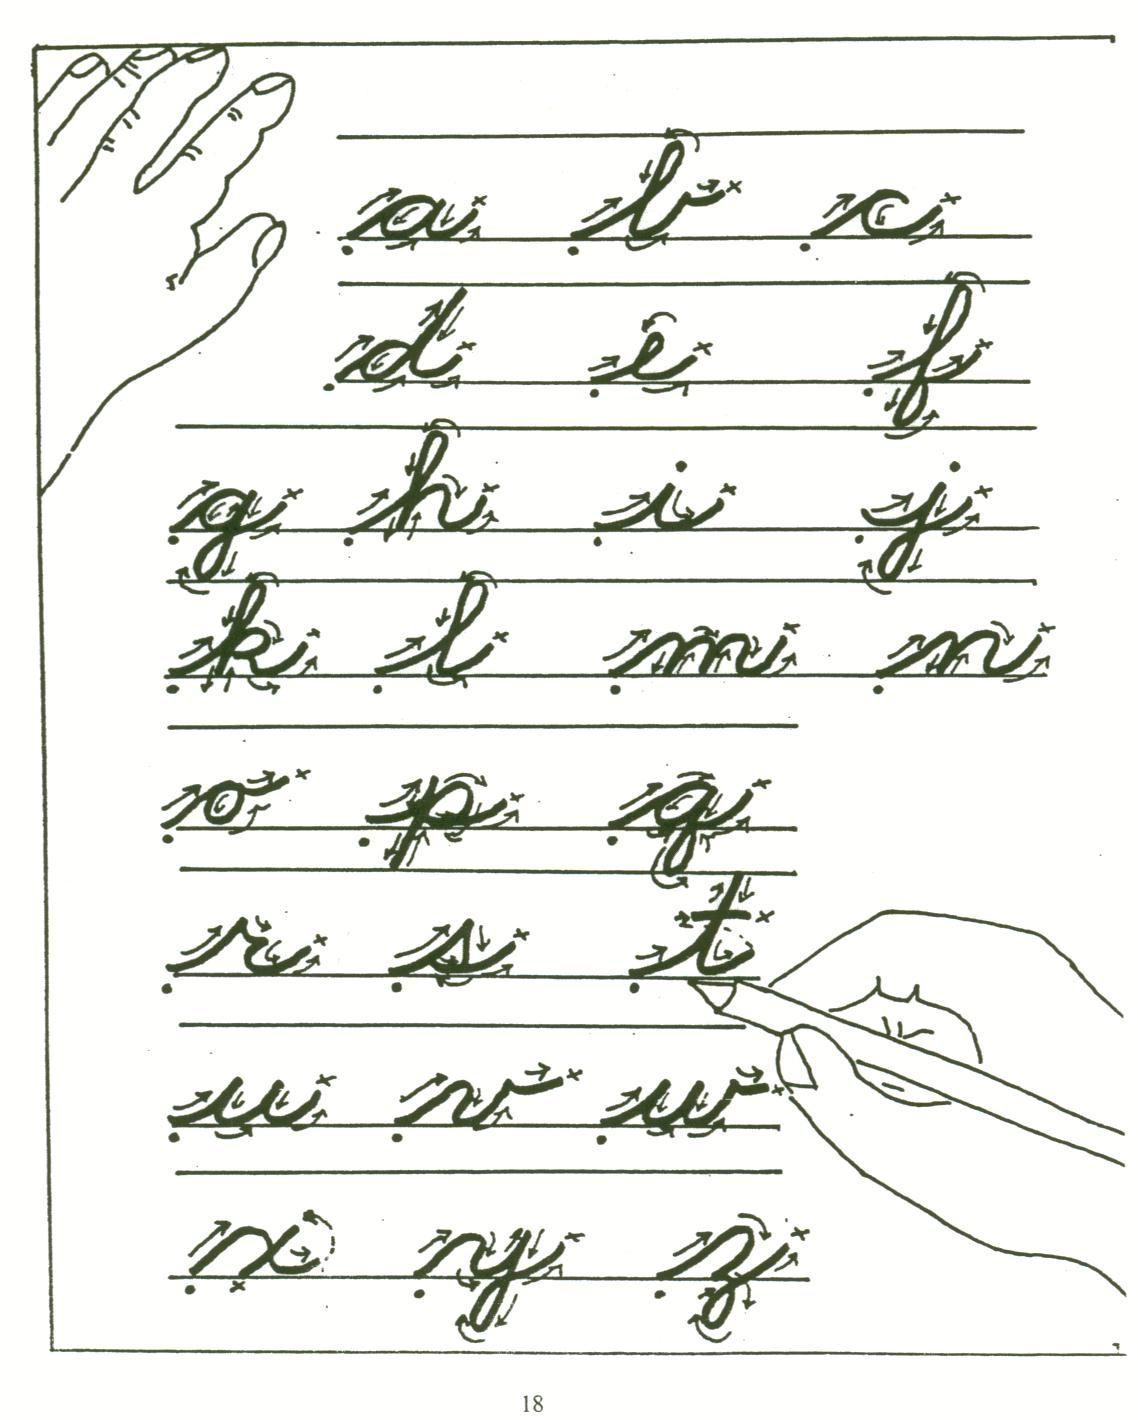 Practice Cursive Writing